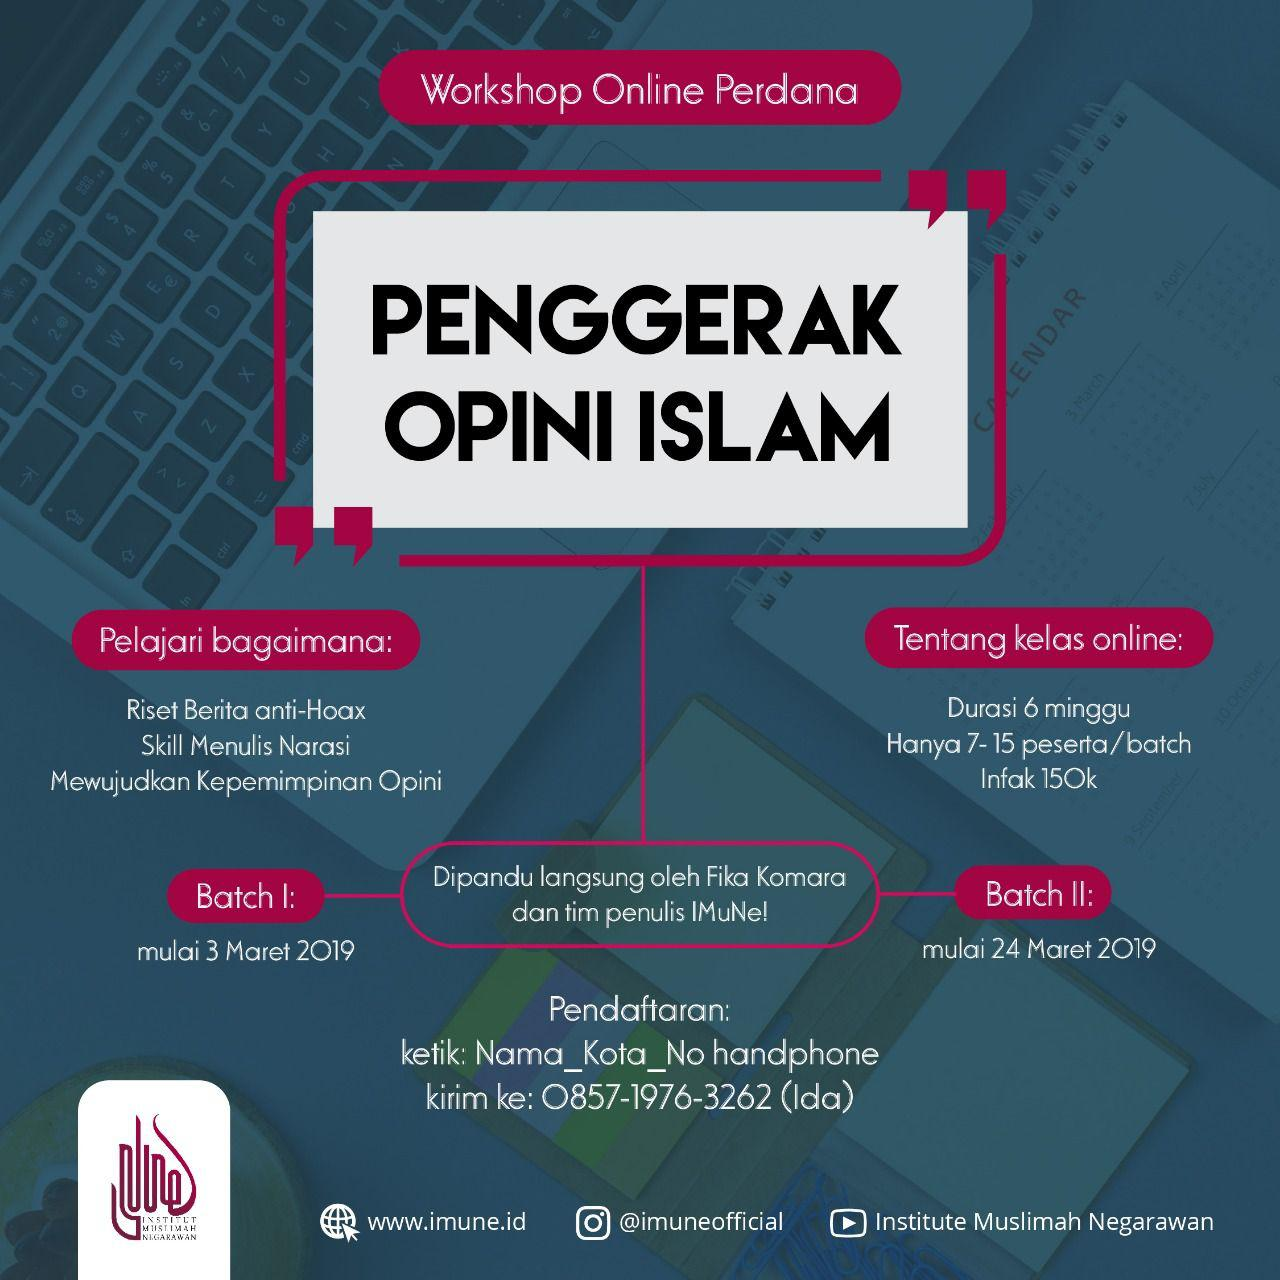 Workshop Online Perdana: Penggerak Opini Islam